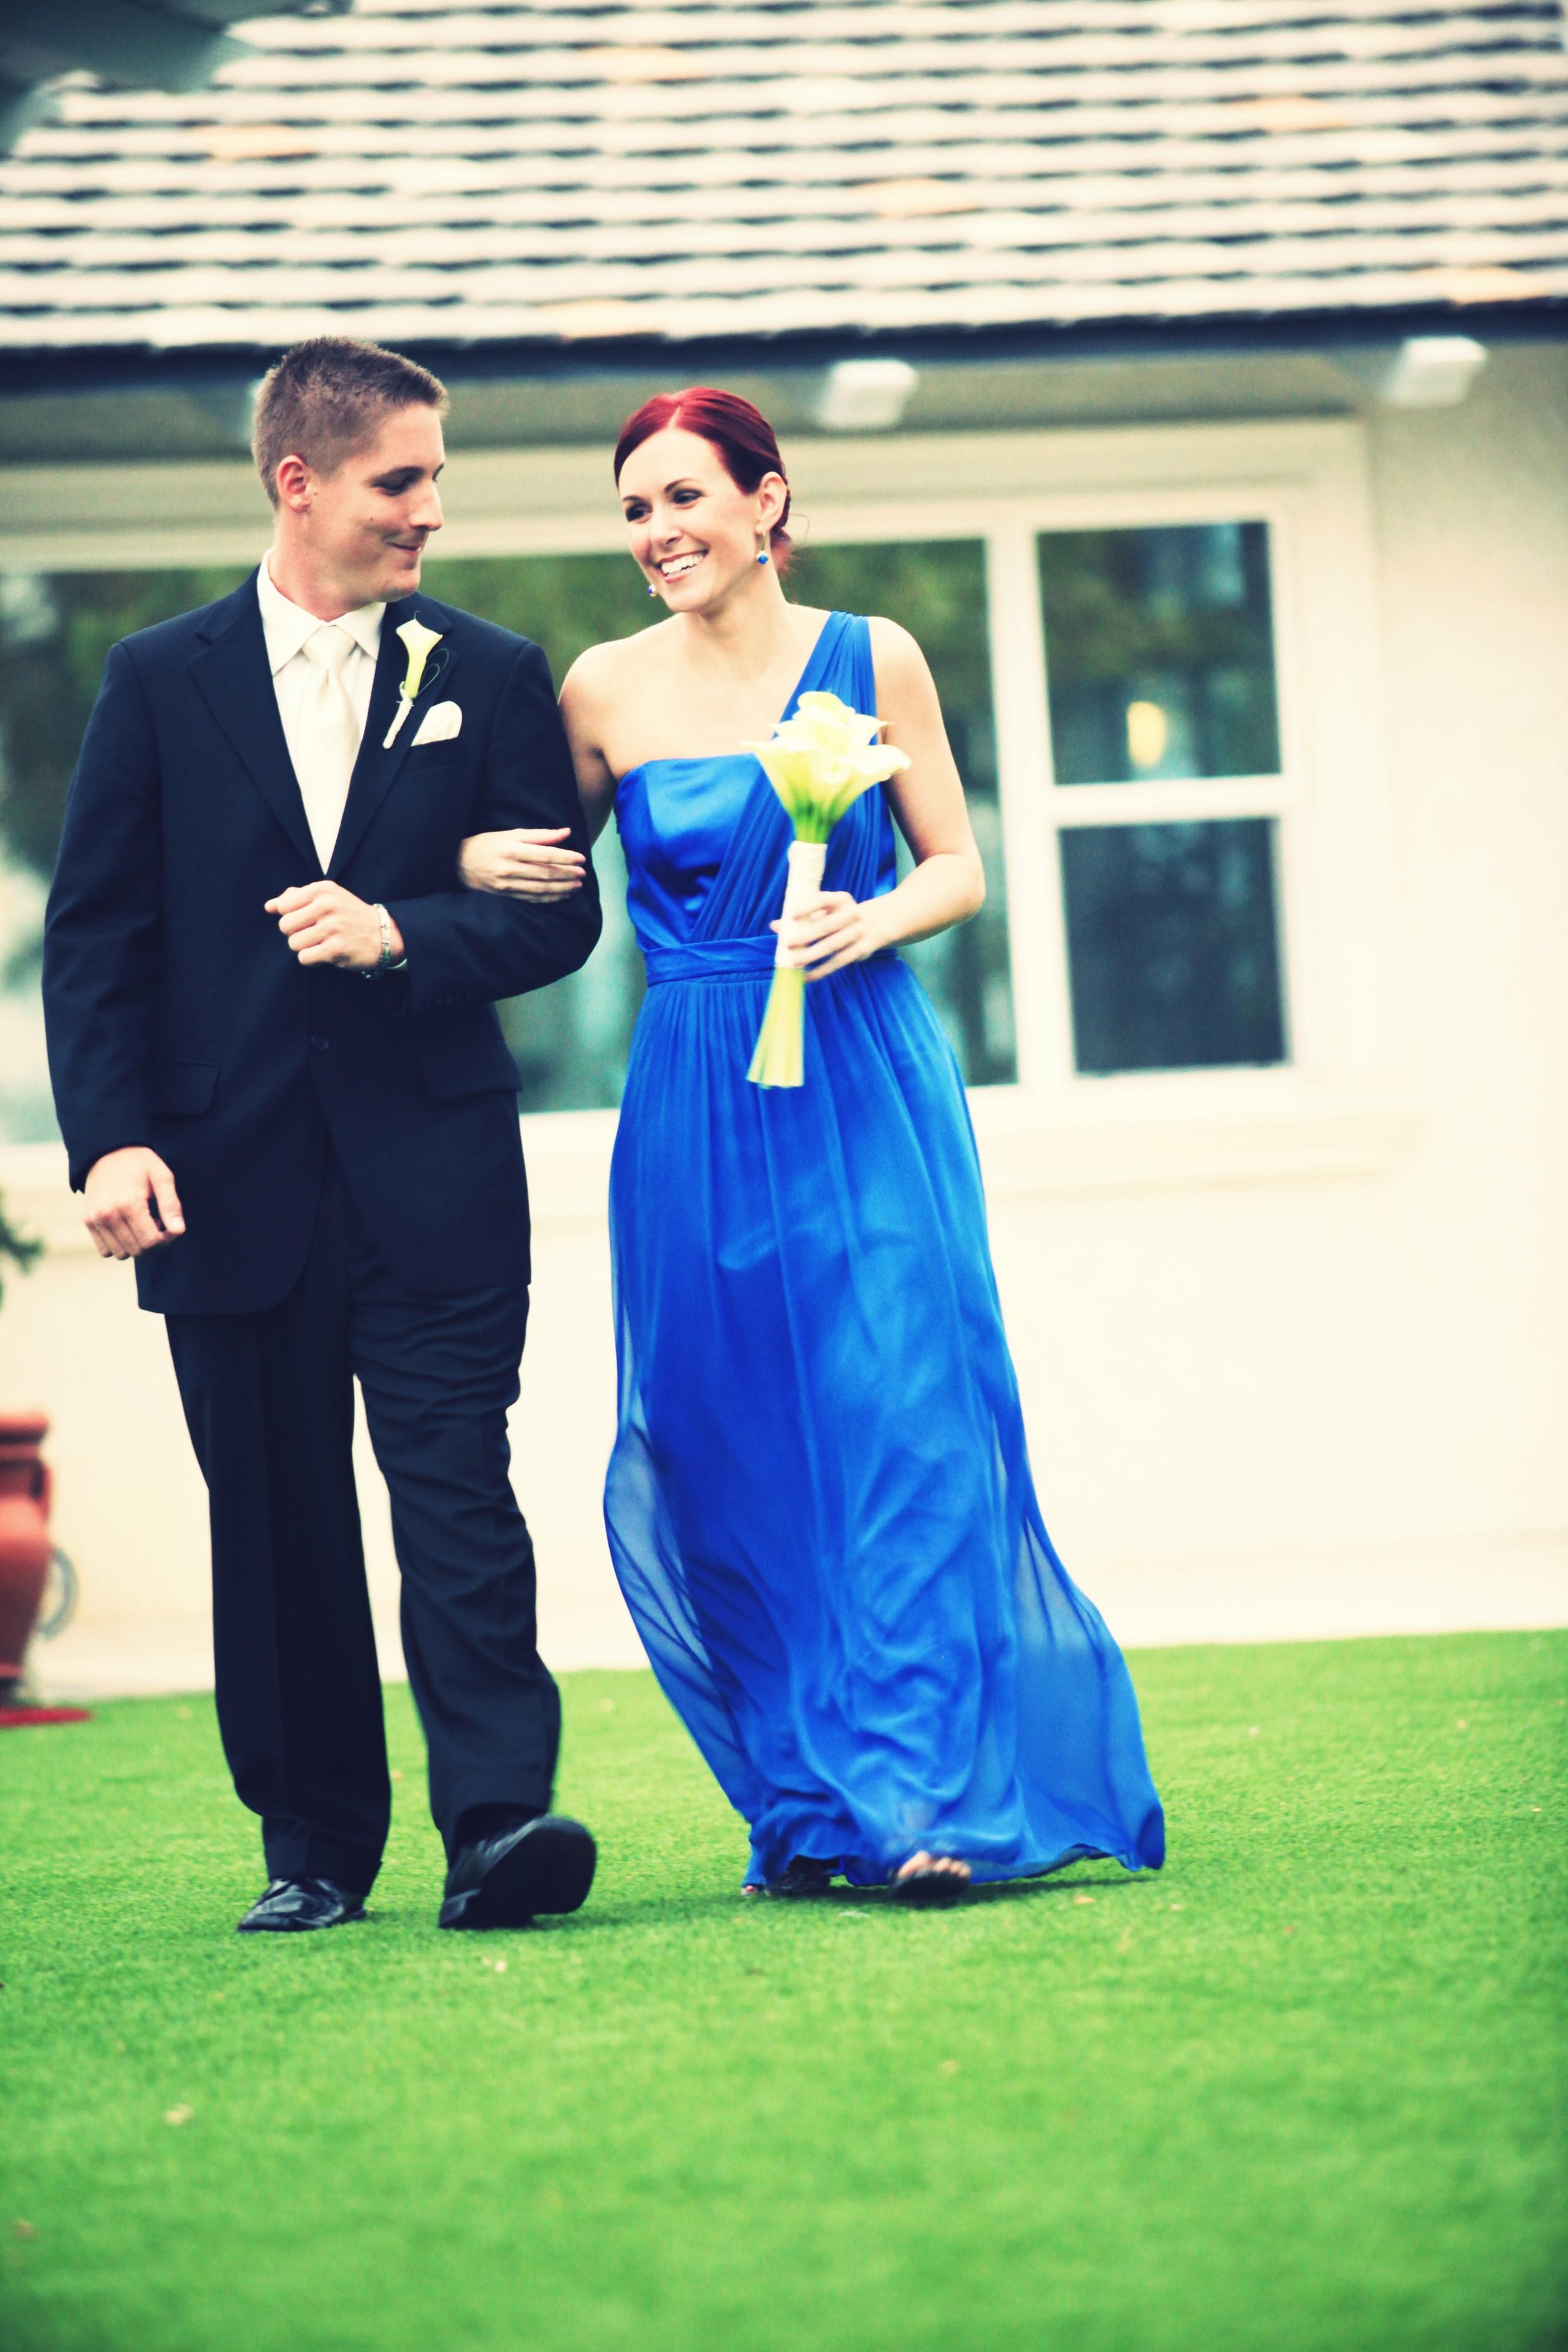 c and j wedding 2_effected.jpg